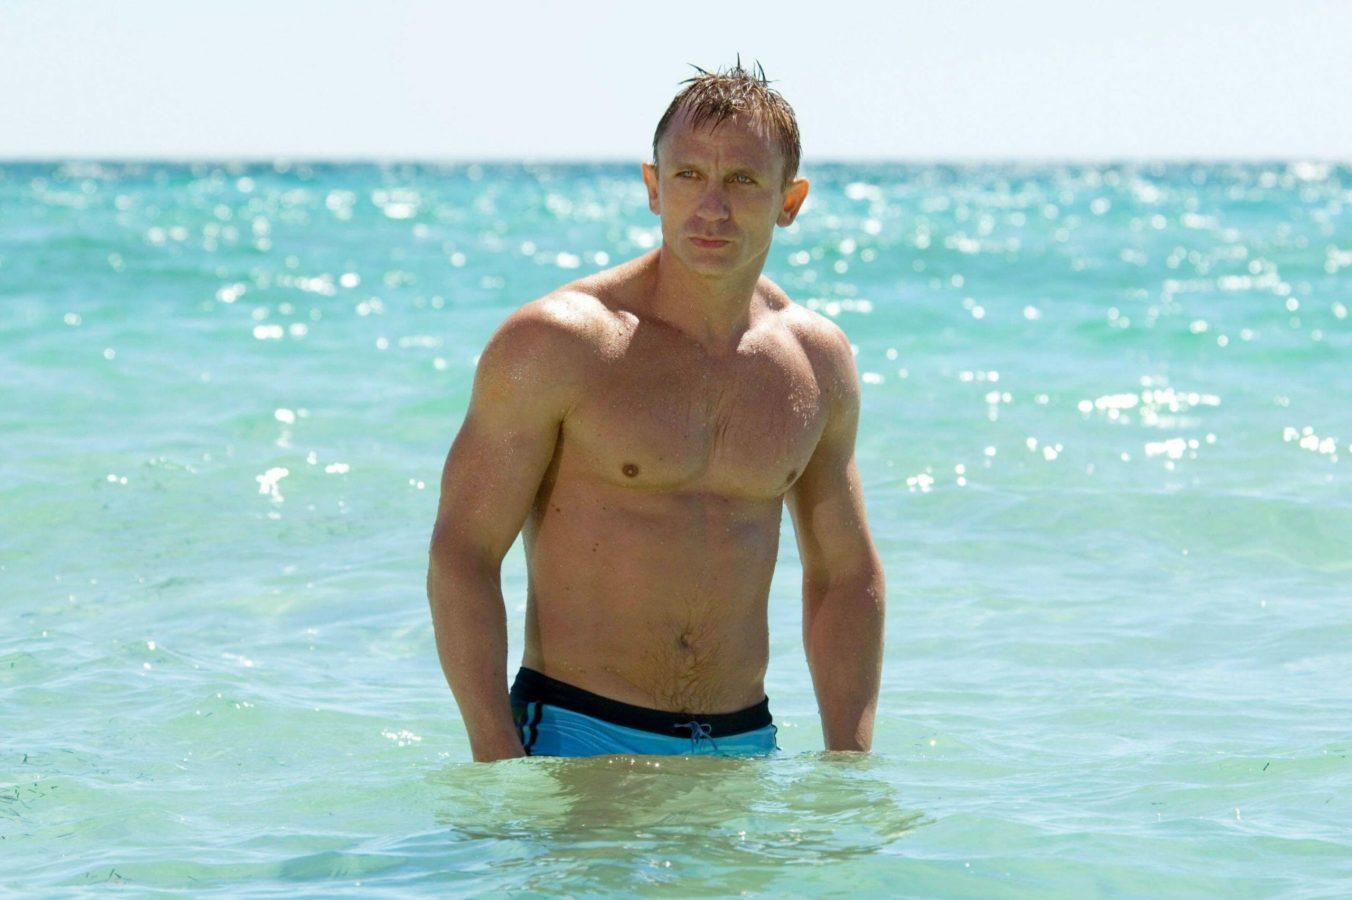 Goodbye, Daniel Craig: who will become the next James Bond?